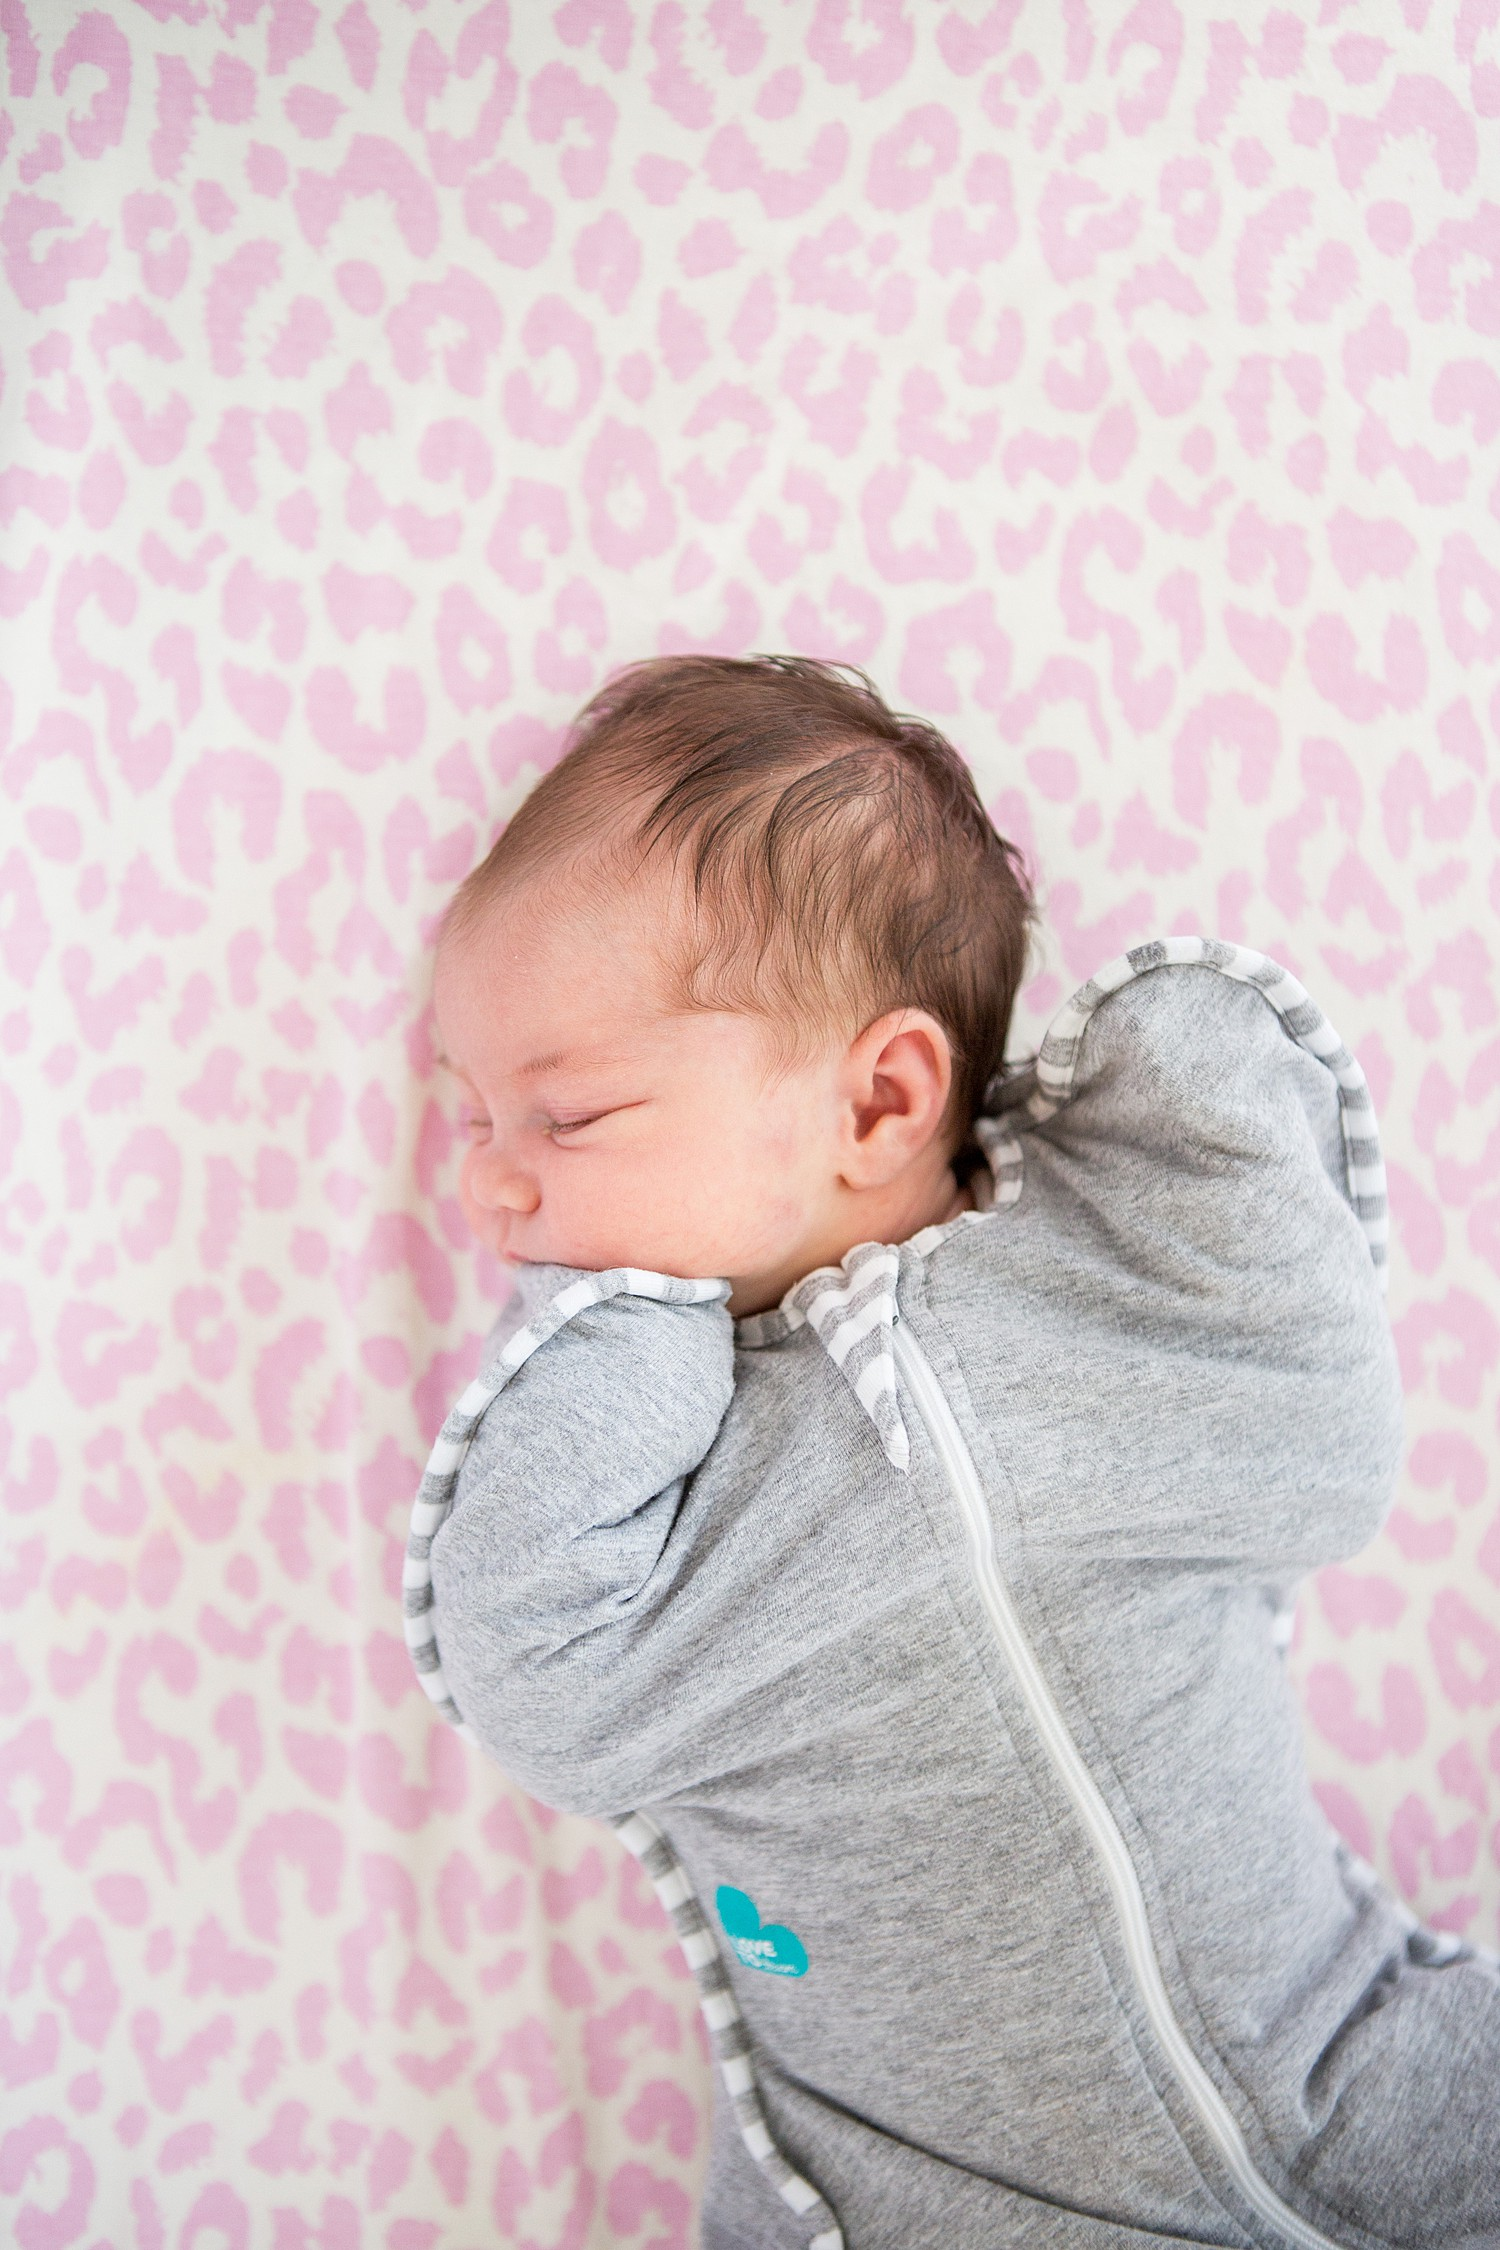 perth_newborn_lifestyle_photography_0029.jpg